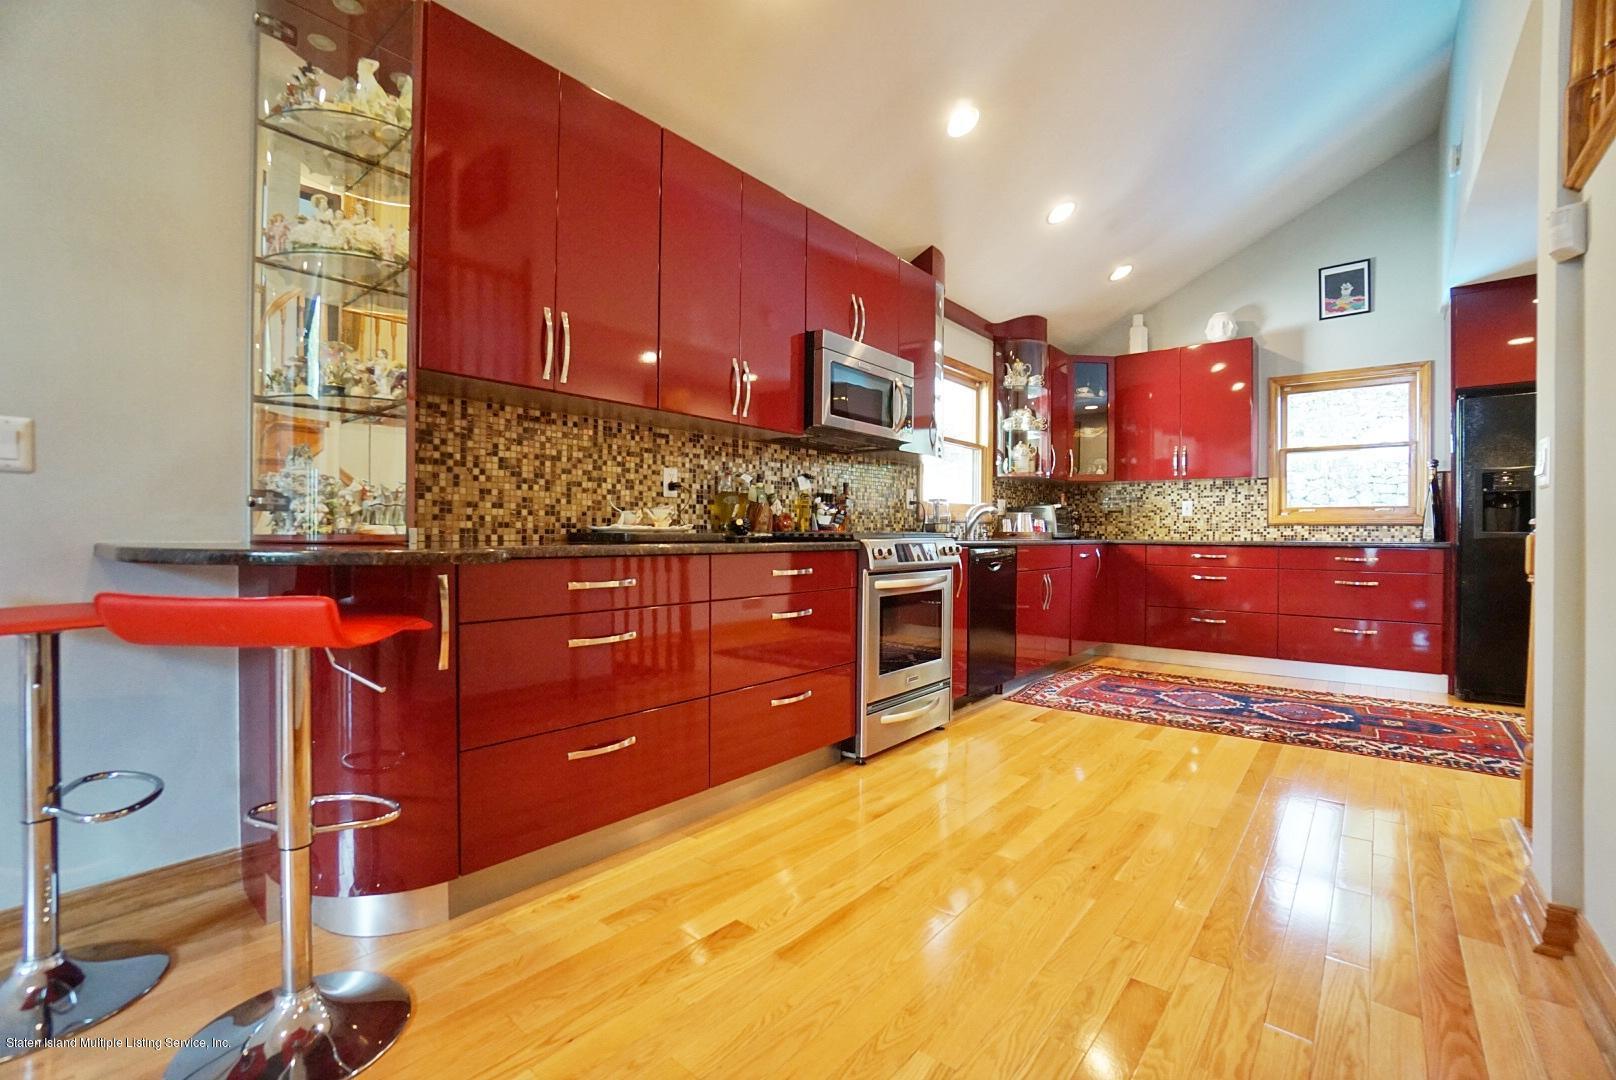 Single Family - Detached 48 Ocean Terrace  Staten Island, NY 10314, MLS-1130826-17